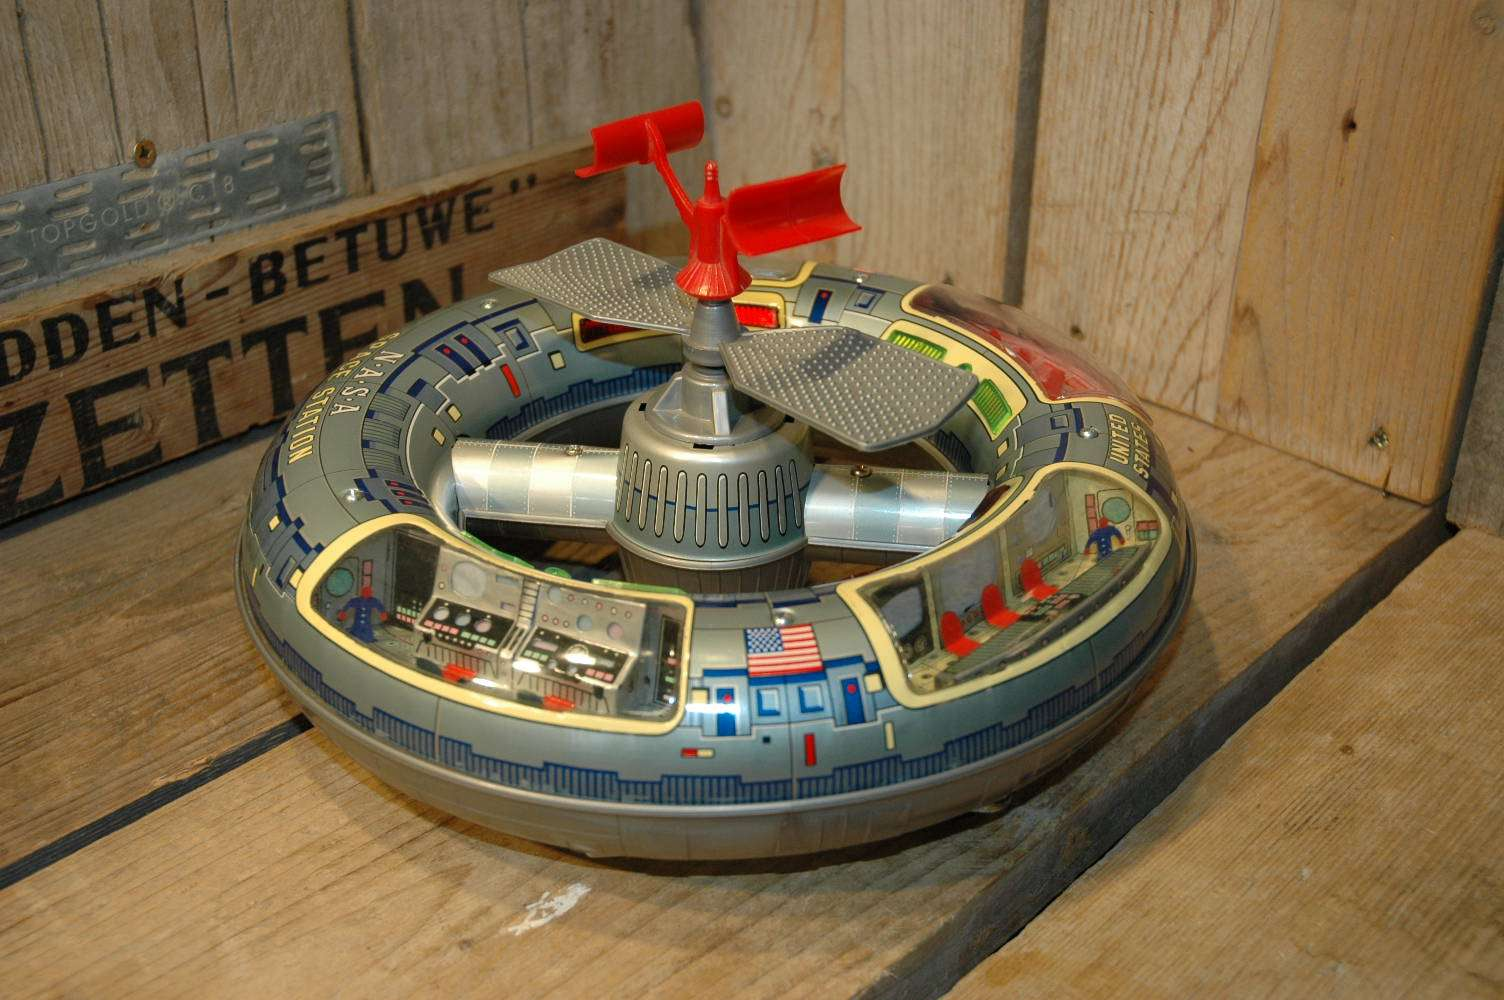 Horikawa - New Space Station